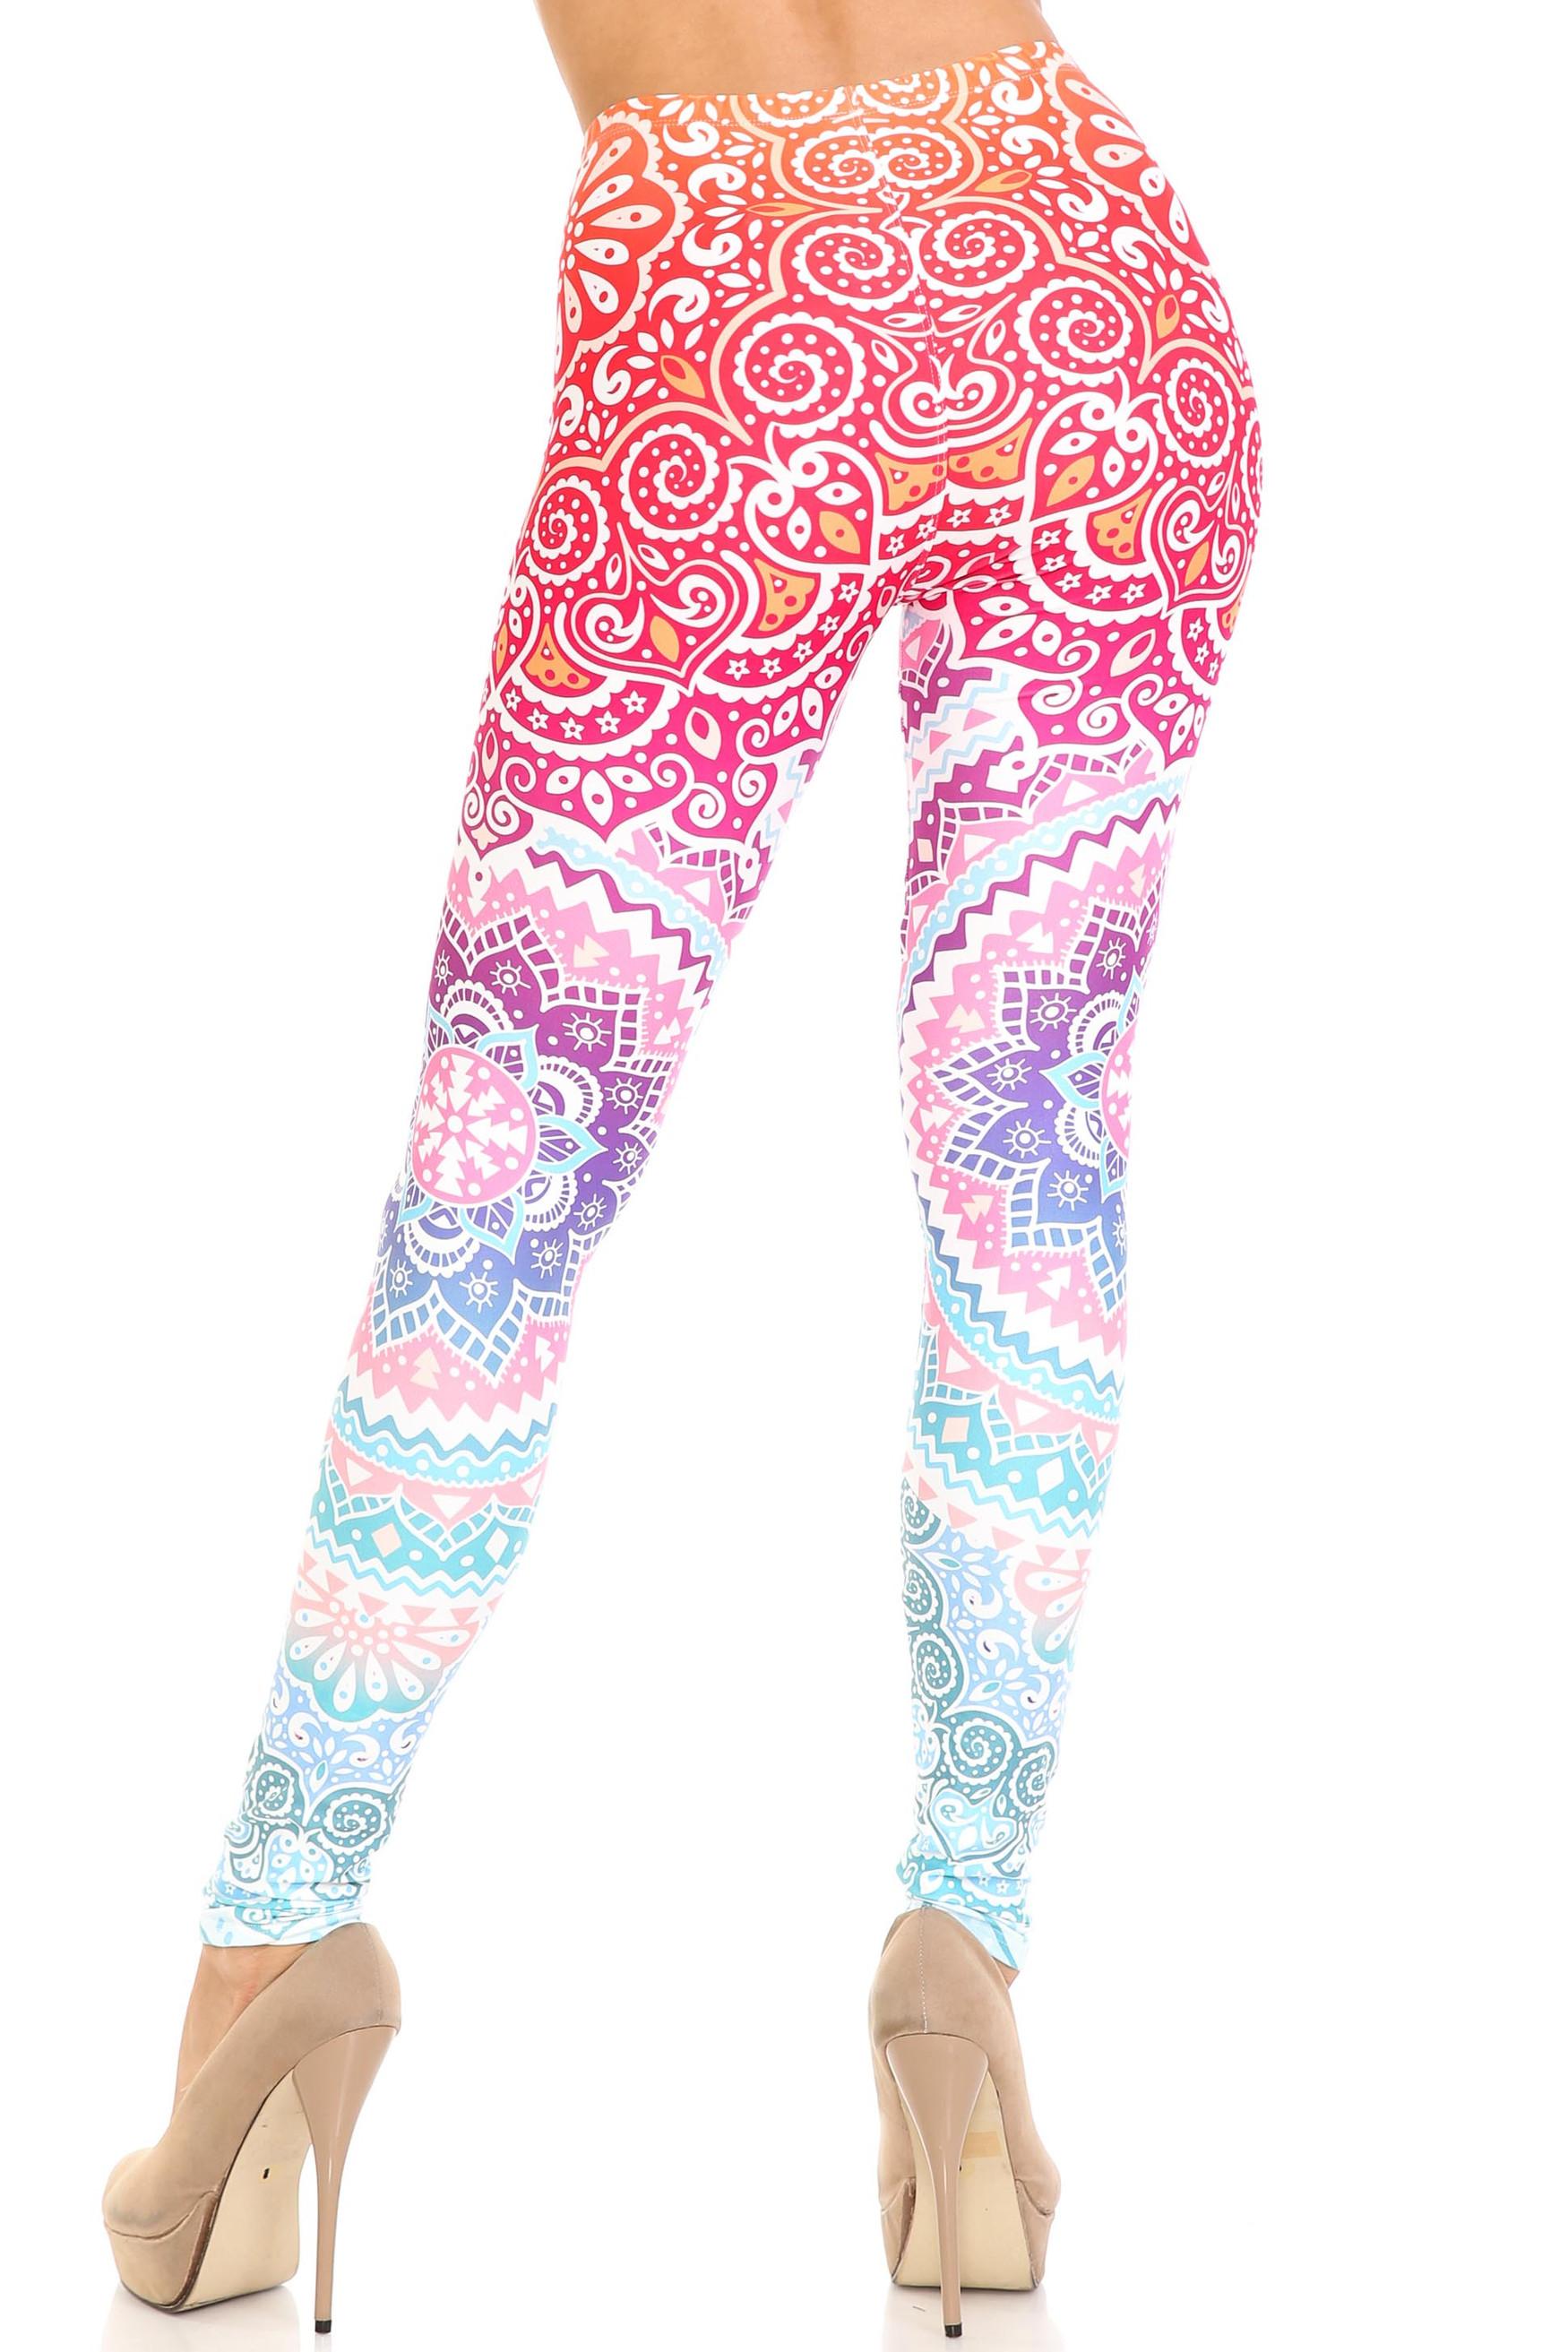 Creamy Soft Ombre Mandala Aztec Extra Plus Size Leggings - 3X-5X - USA Fashion™